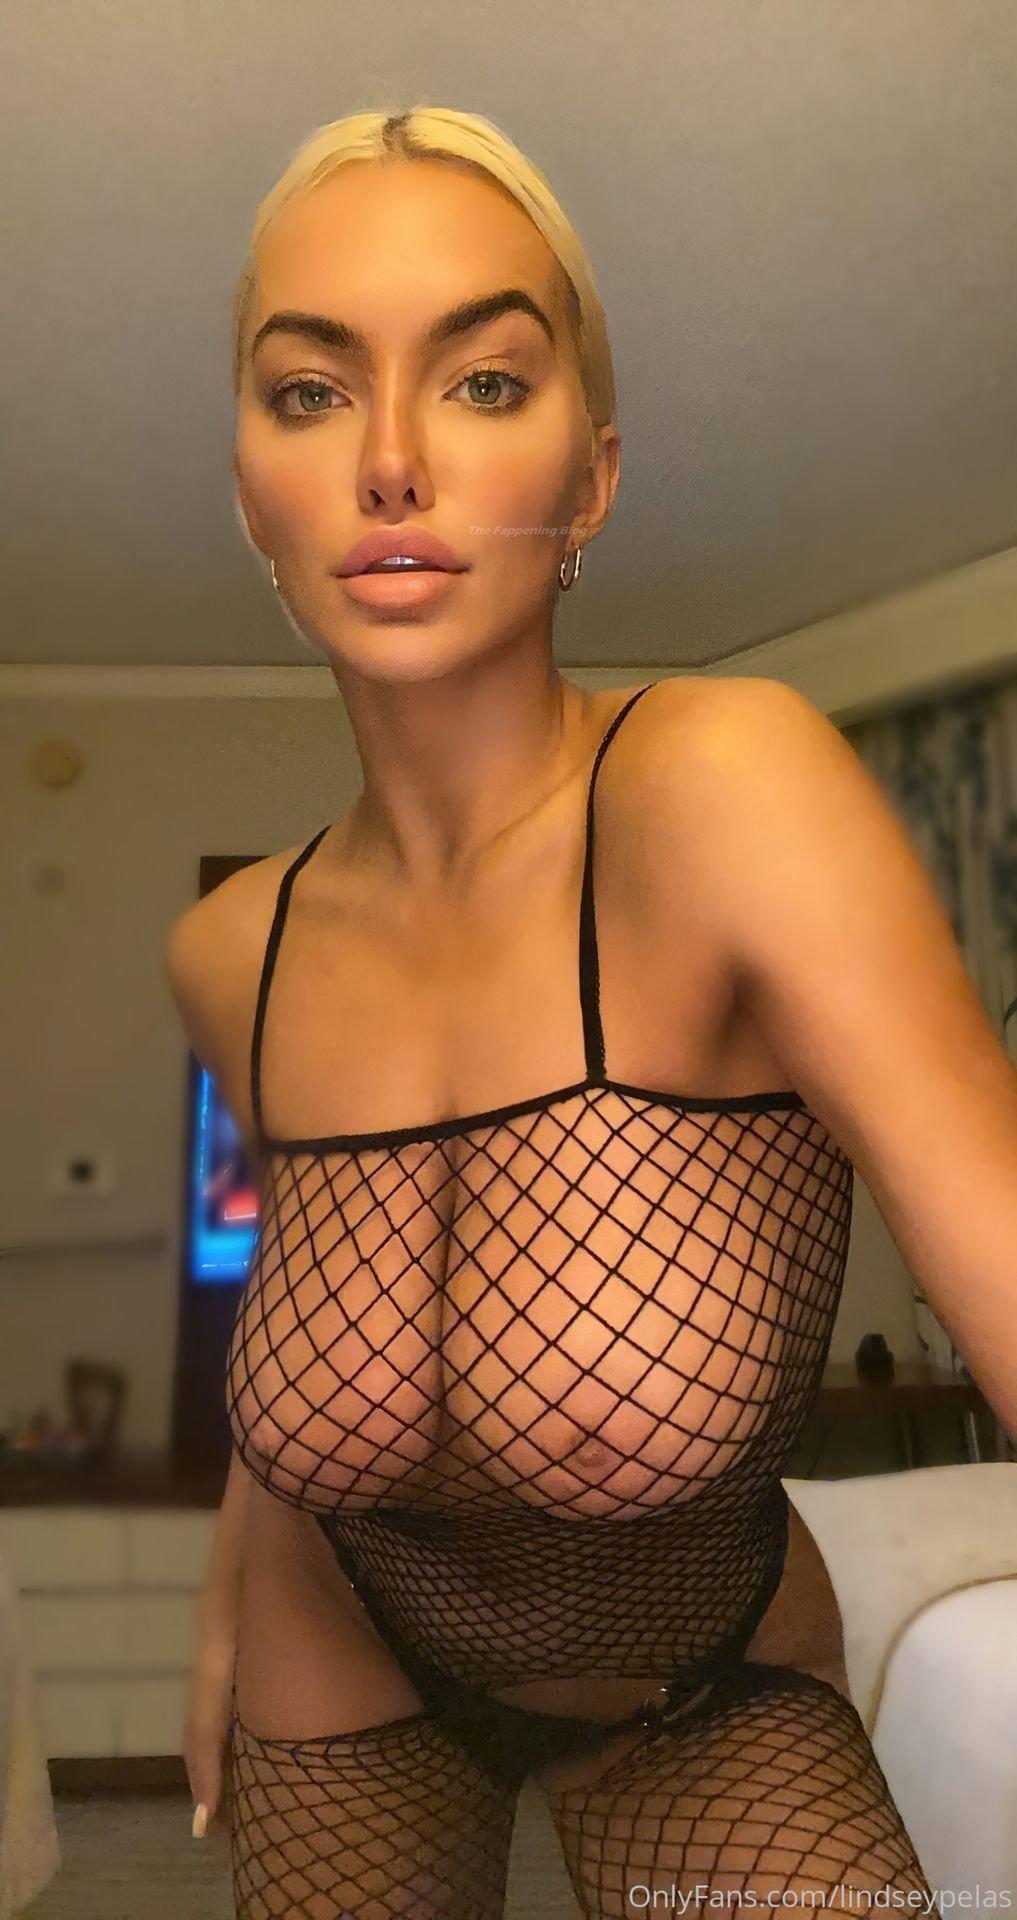 Lindsey Pelas Sexy Tits Butt 5